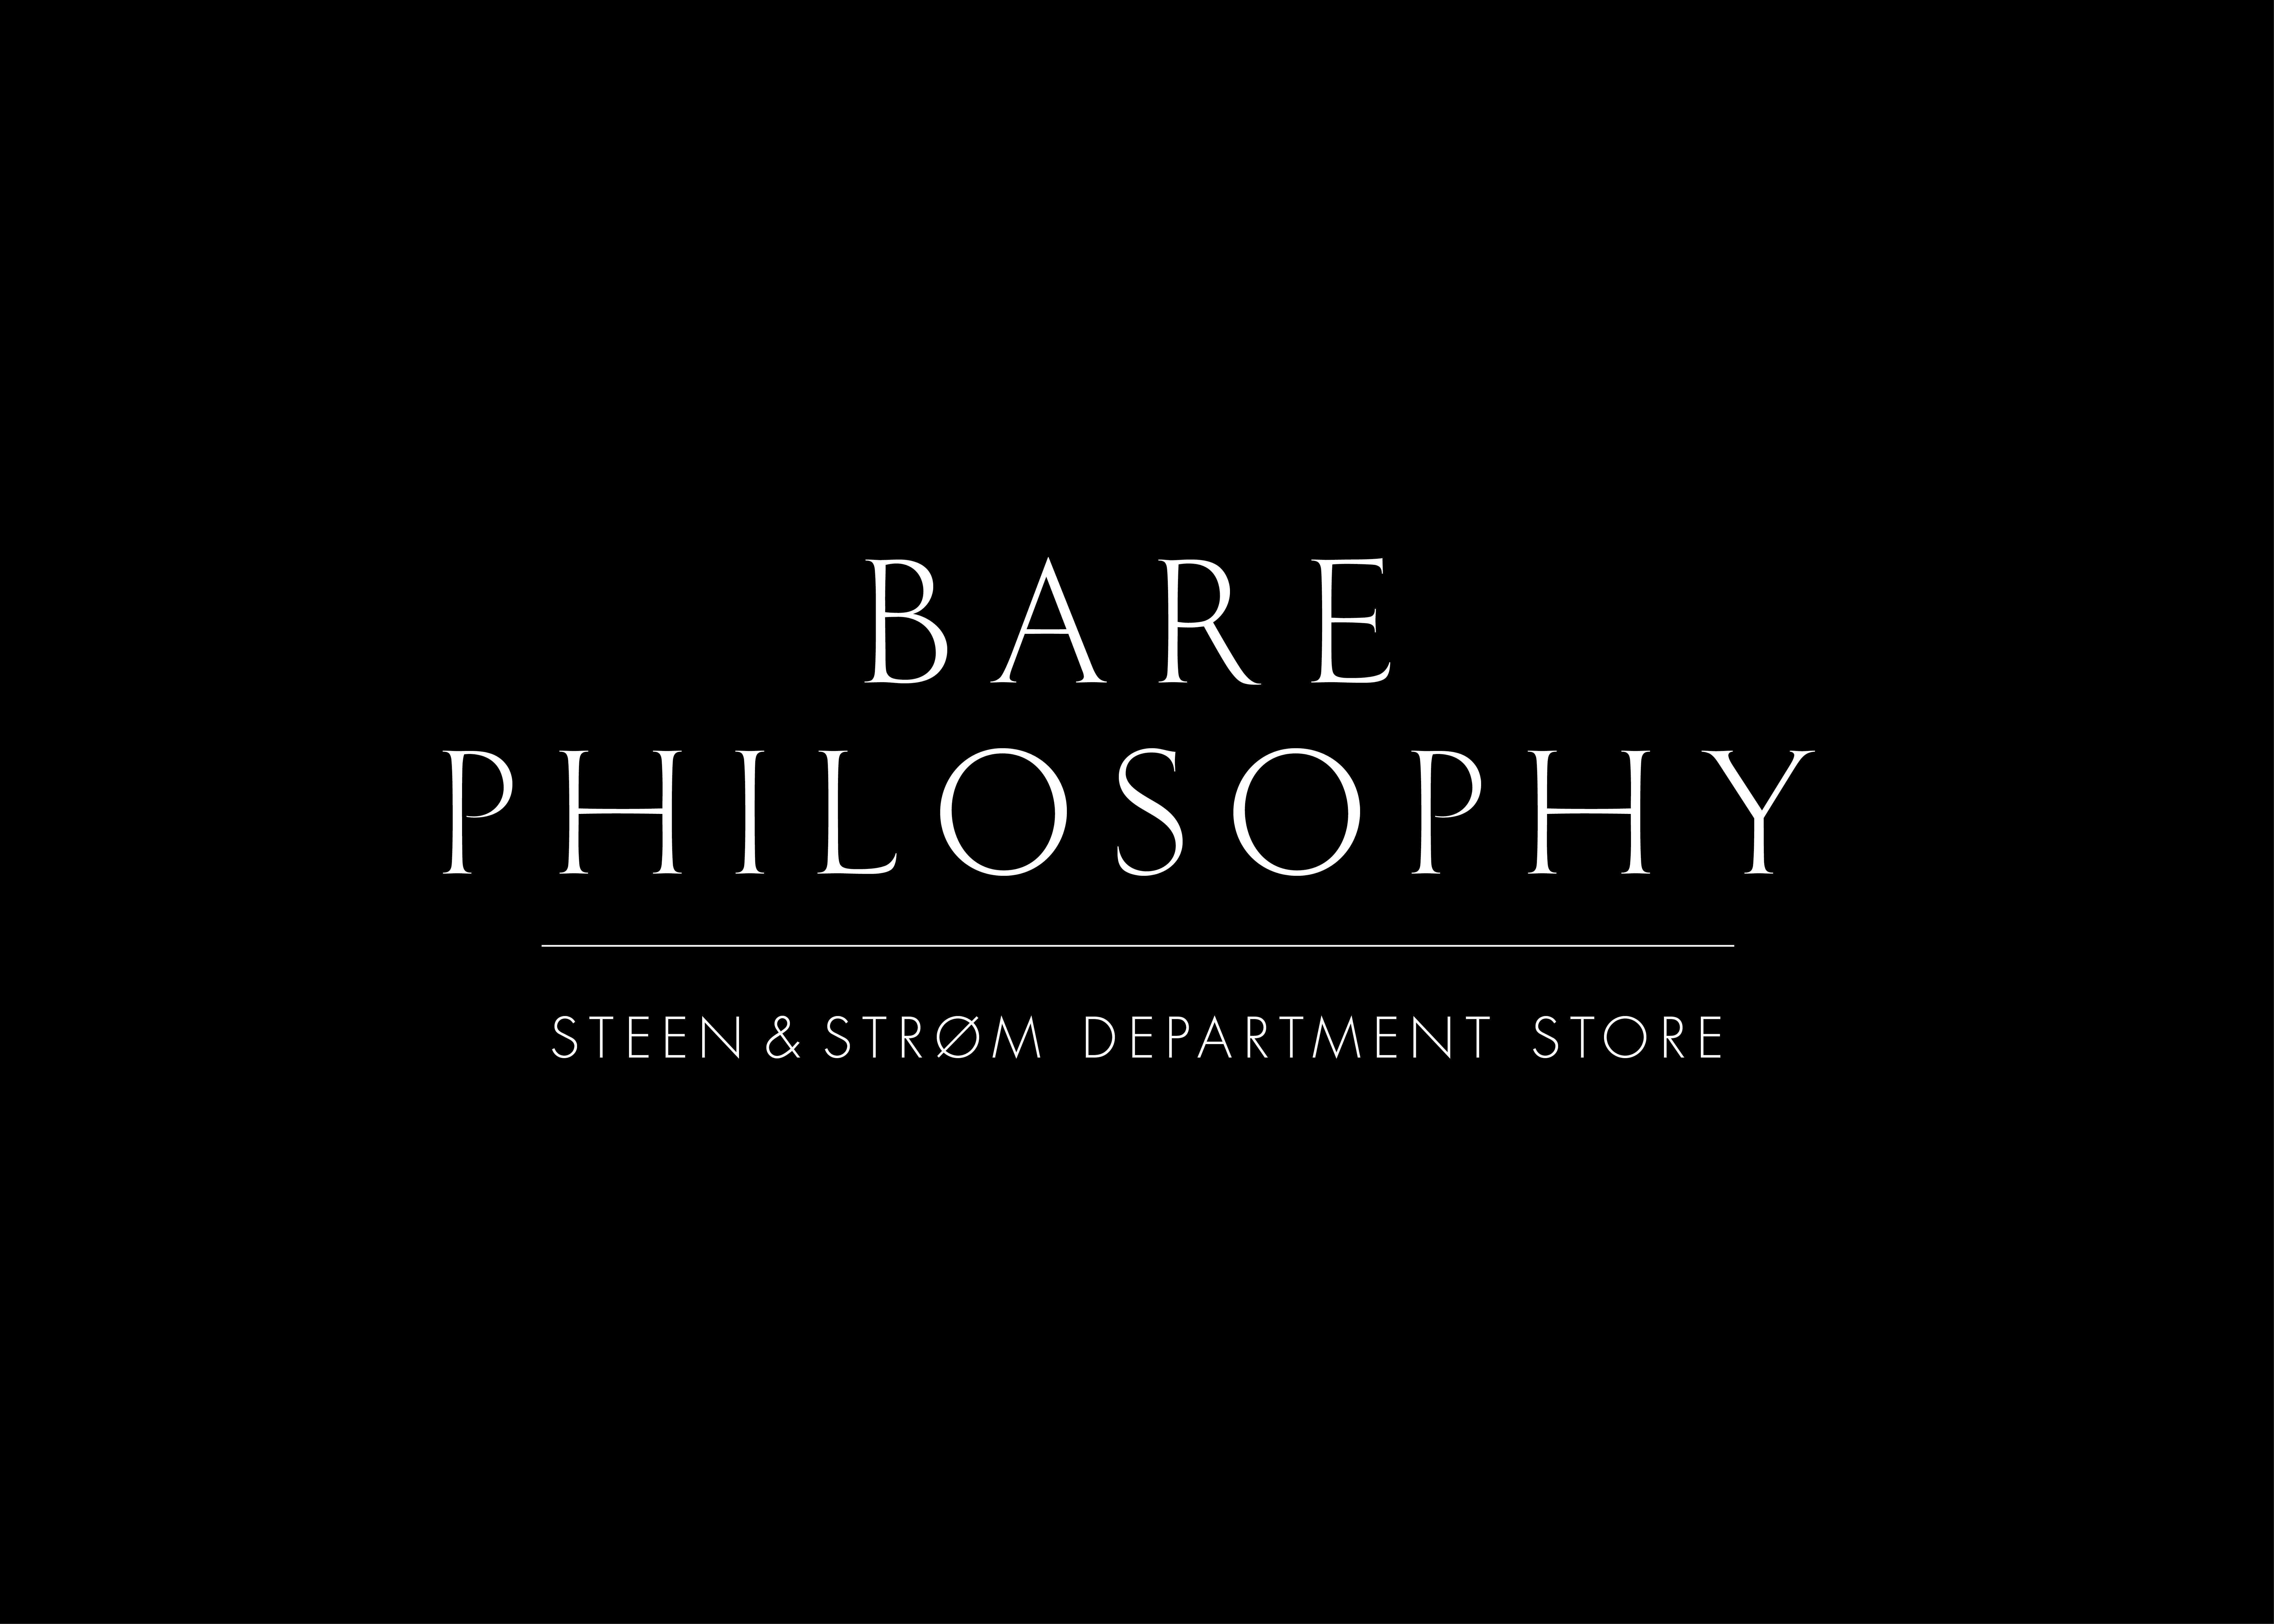 bare_visuell identitet